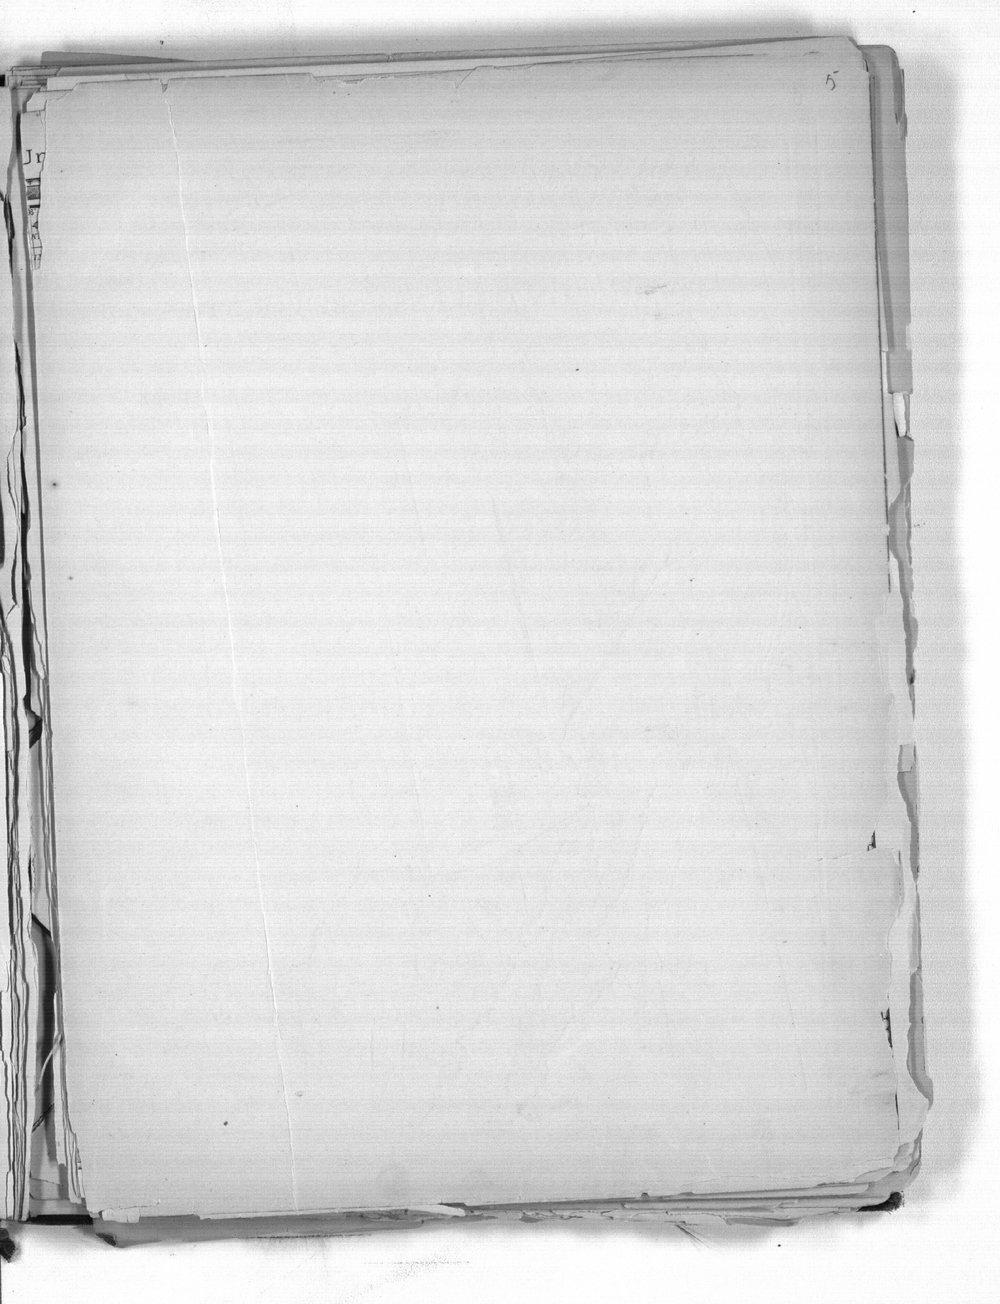 Historical Plat Book of Jackson County, Kansas - 5